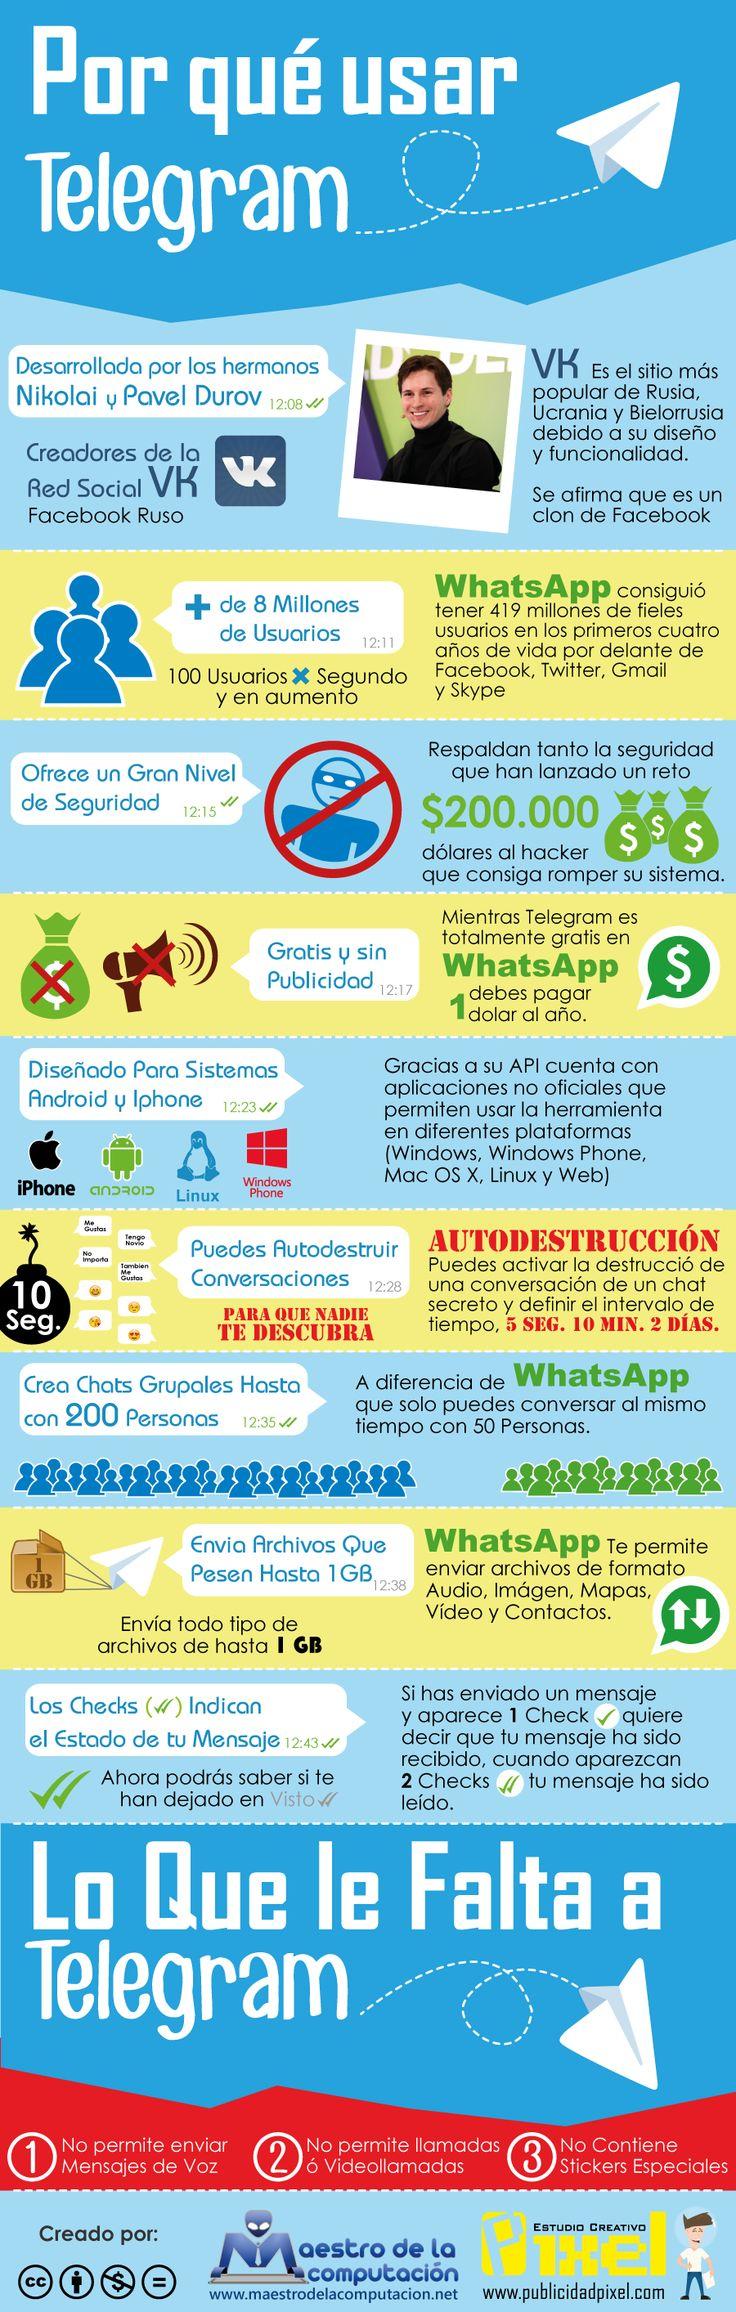 Por qué usar #Telegram